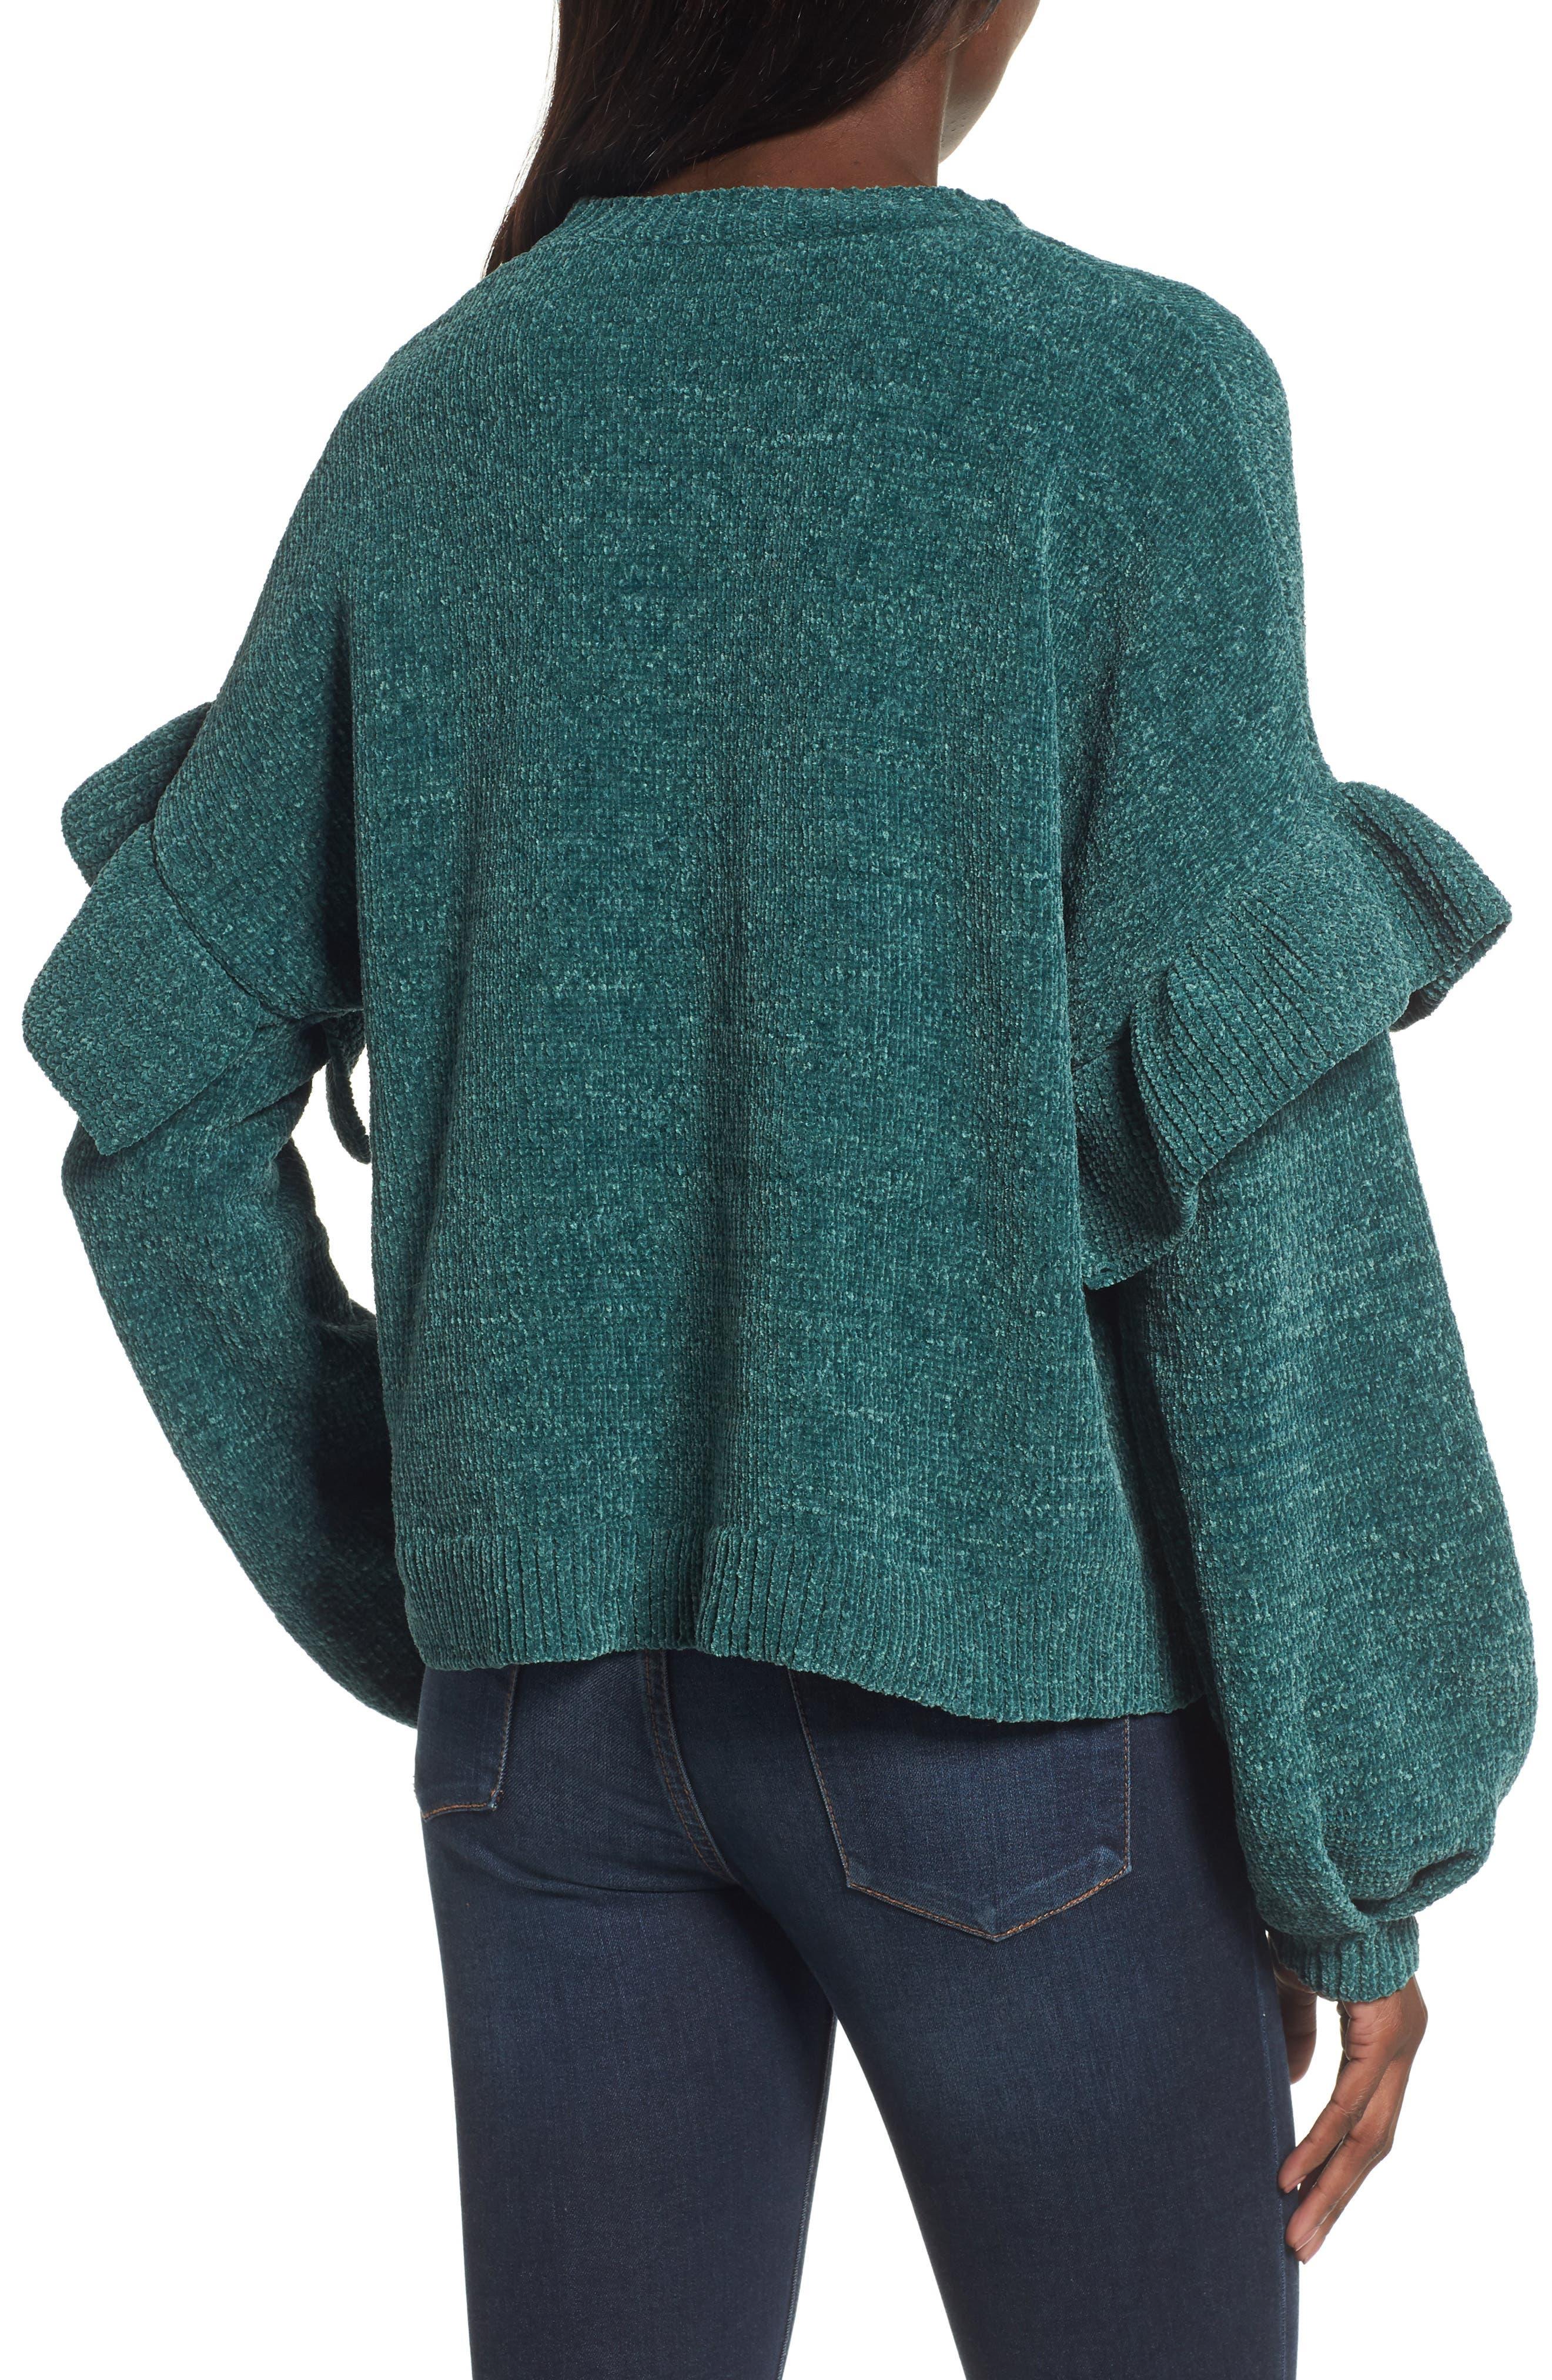 Ruffle Chenille Sweater,                             Alternate thumbnail 2, color,                             Green Jasper